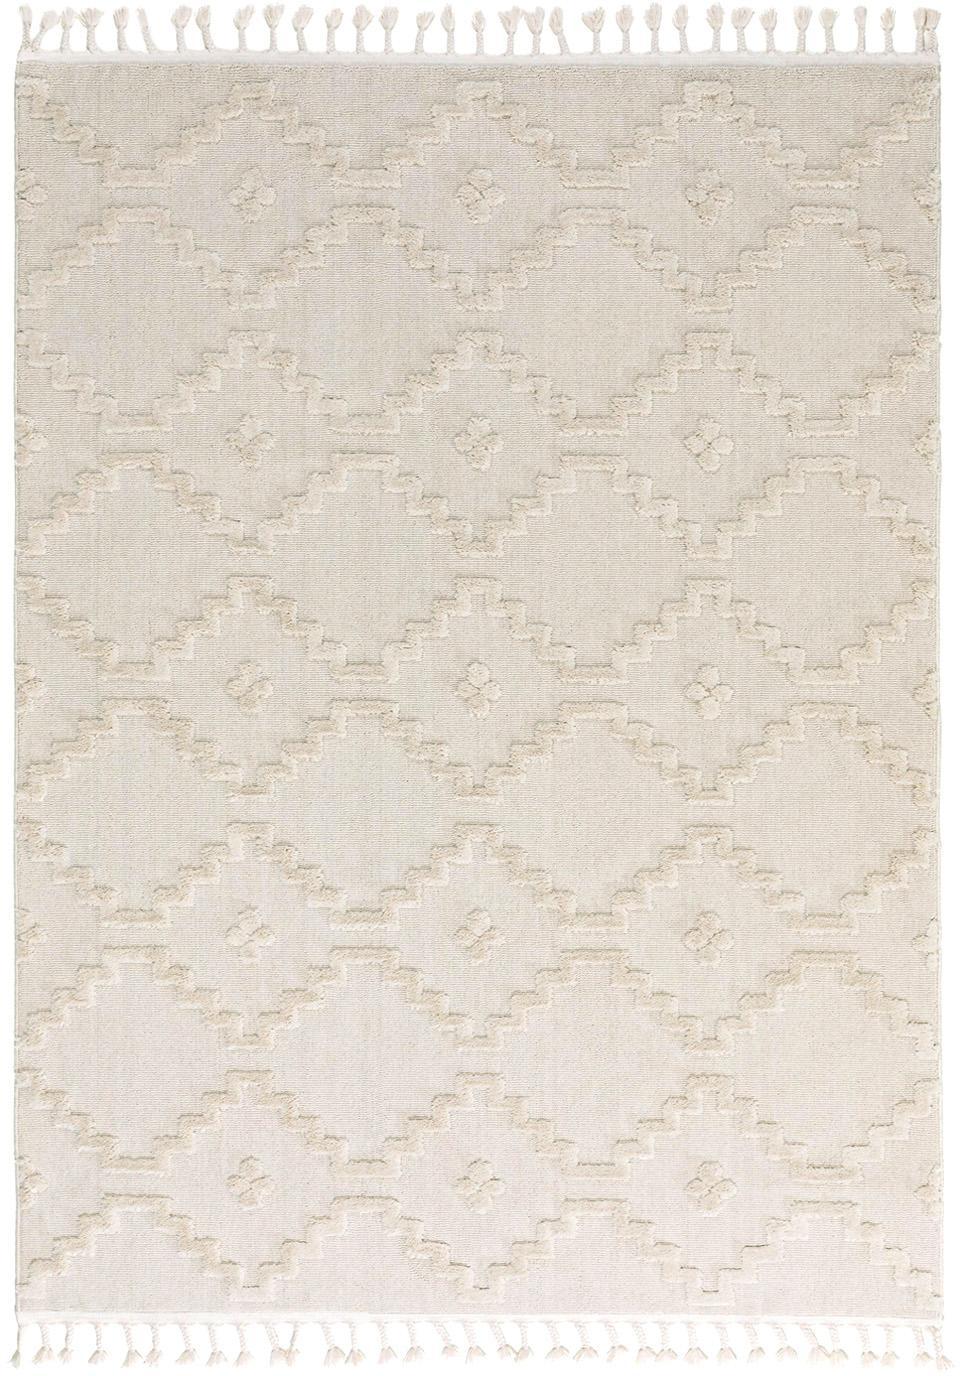 Teppich Oyo in Creme mit Reliefoptik, Flor: Polyester, Creme, B 160 x L 230 cm (Größe M)